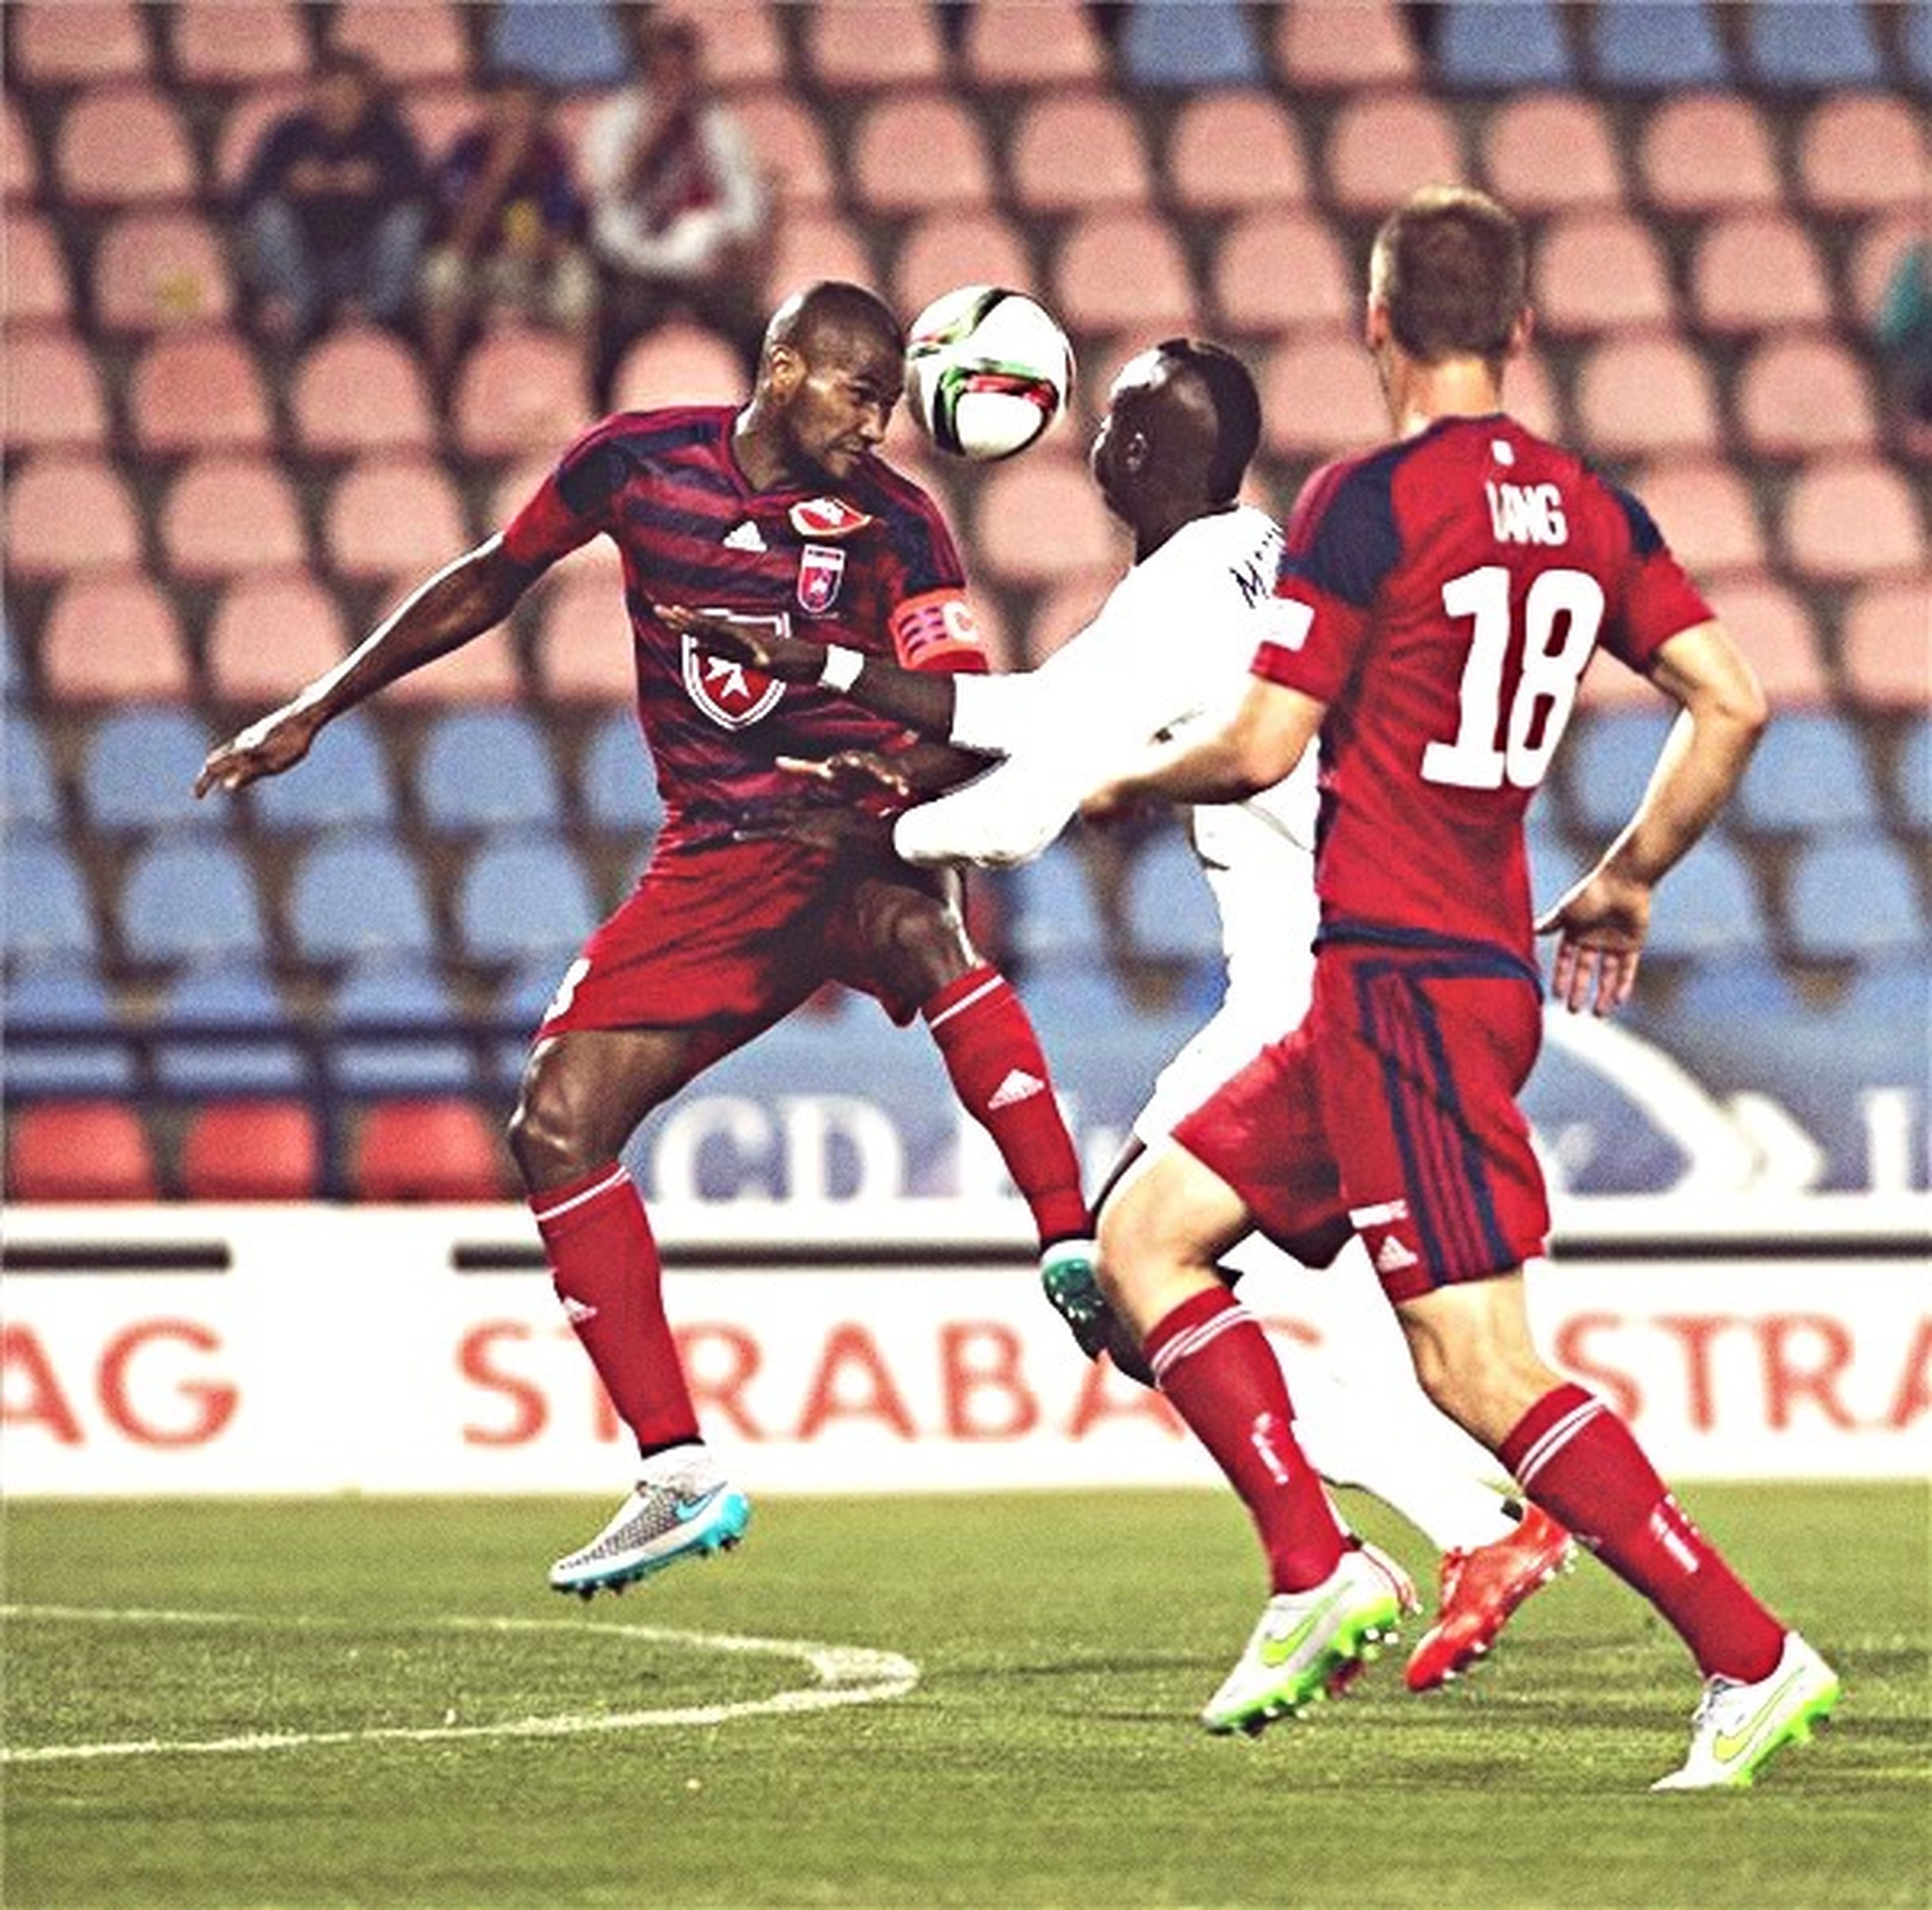 Videoton Videotonfc Vinicius Football Vidi First Eyeem Photo